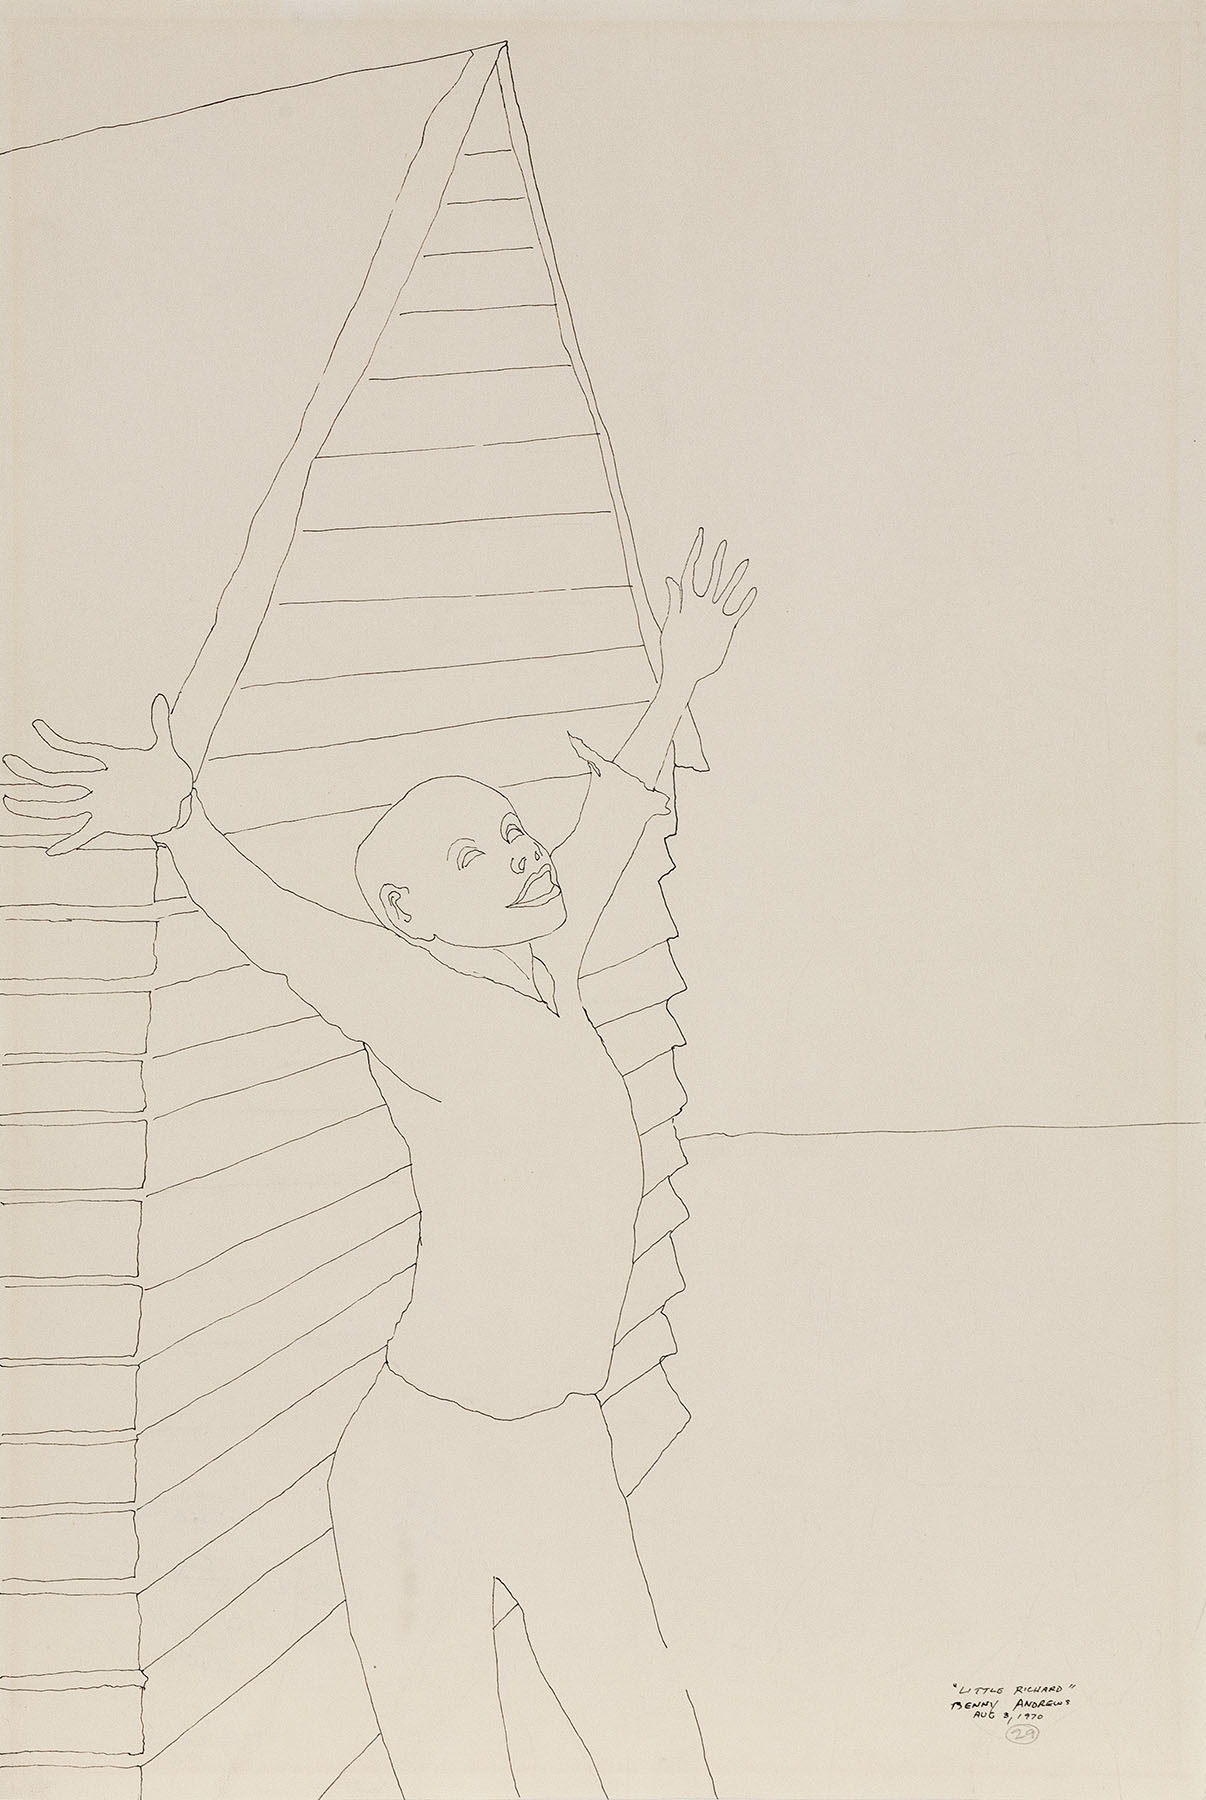 Andrews, Little Richard (Study for Symbols)-IMAGE ONLY.jpg